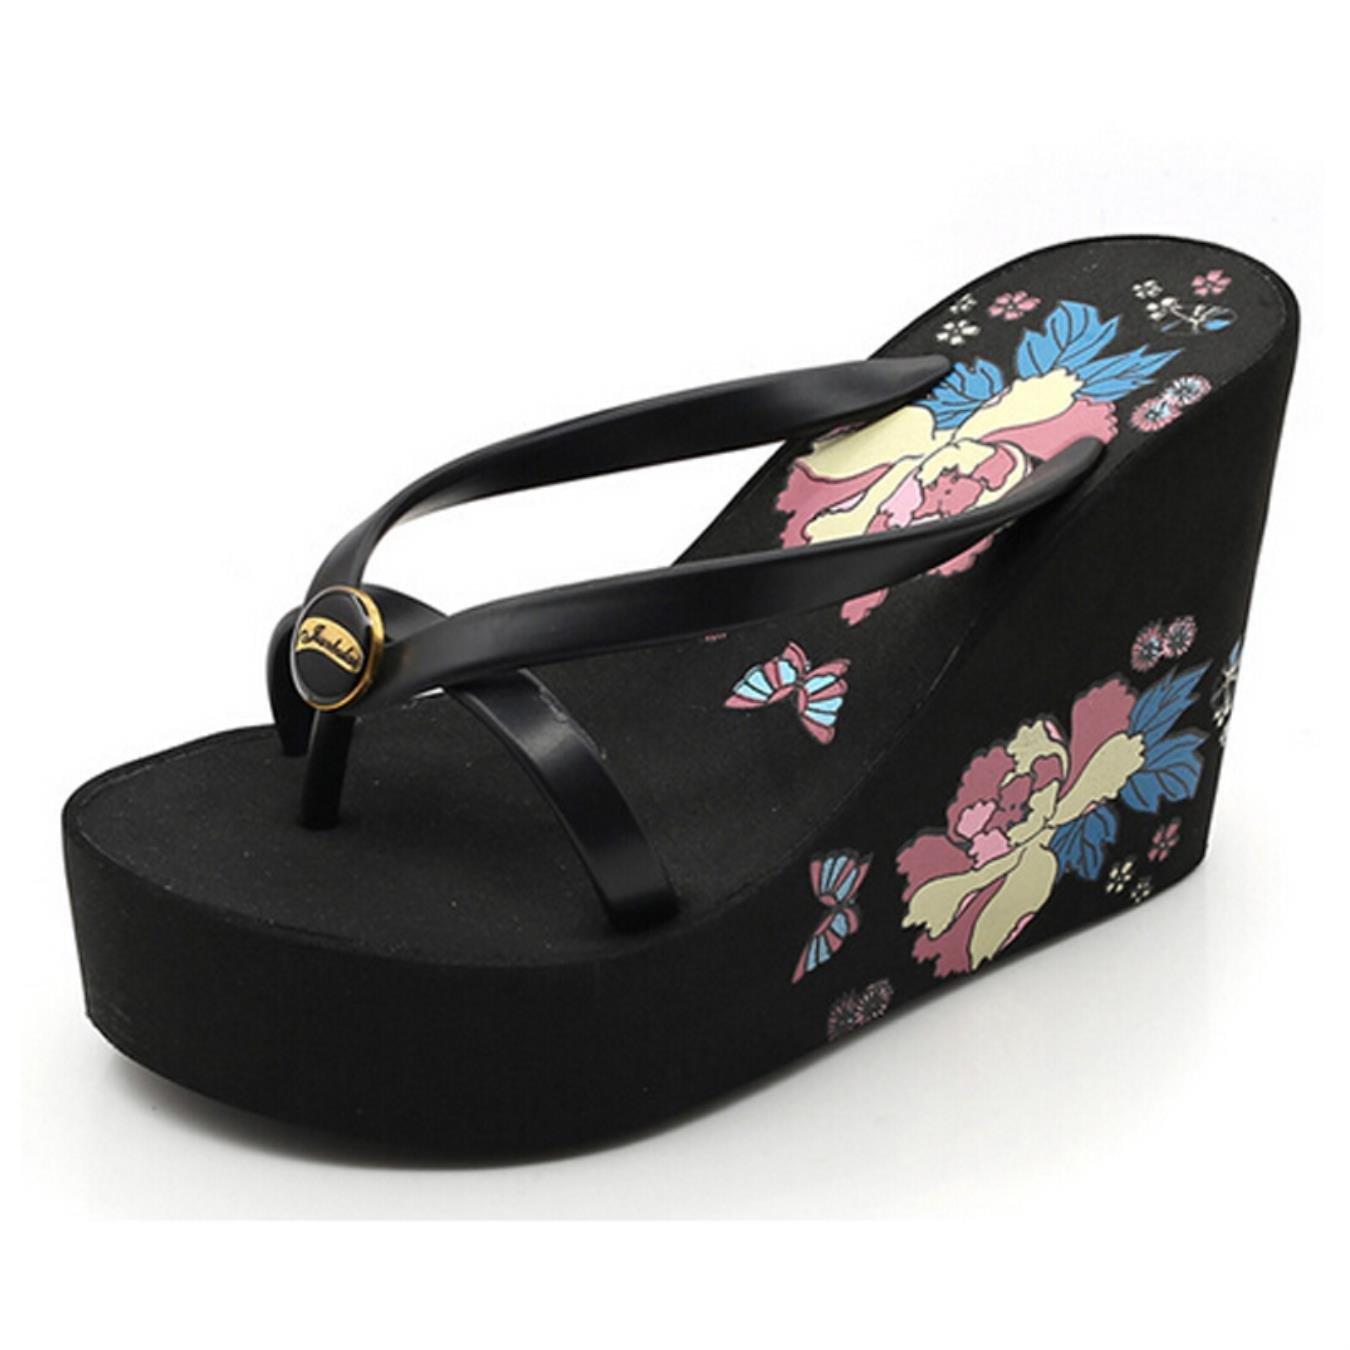 Summer Women Sandals Casual Style Floral Flip Flops High Platform Wedges Hot Shoes Woman Size 35-39